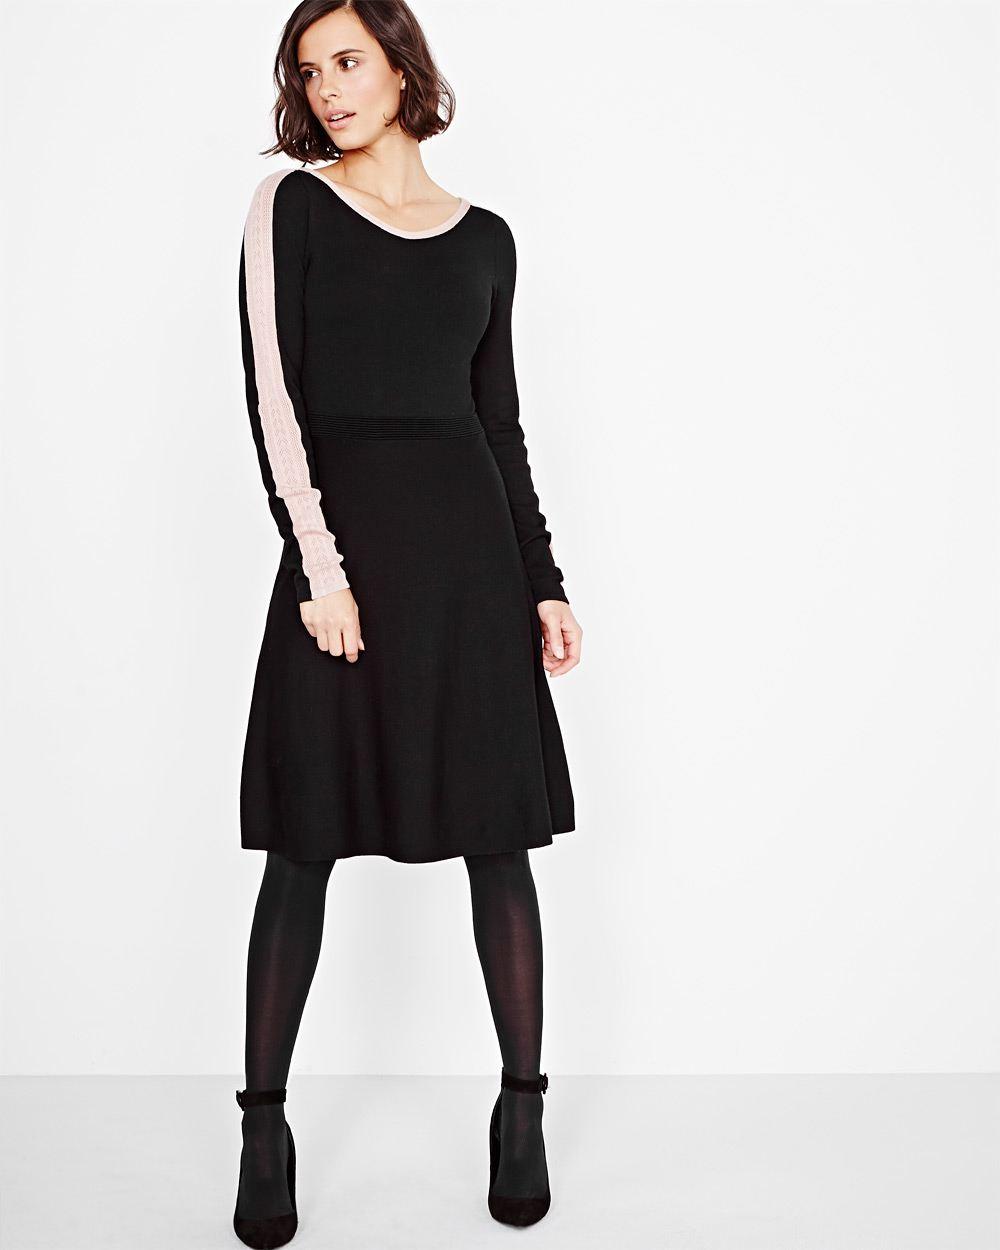 robe évasée, tricot, dentelle, rw&co